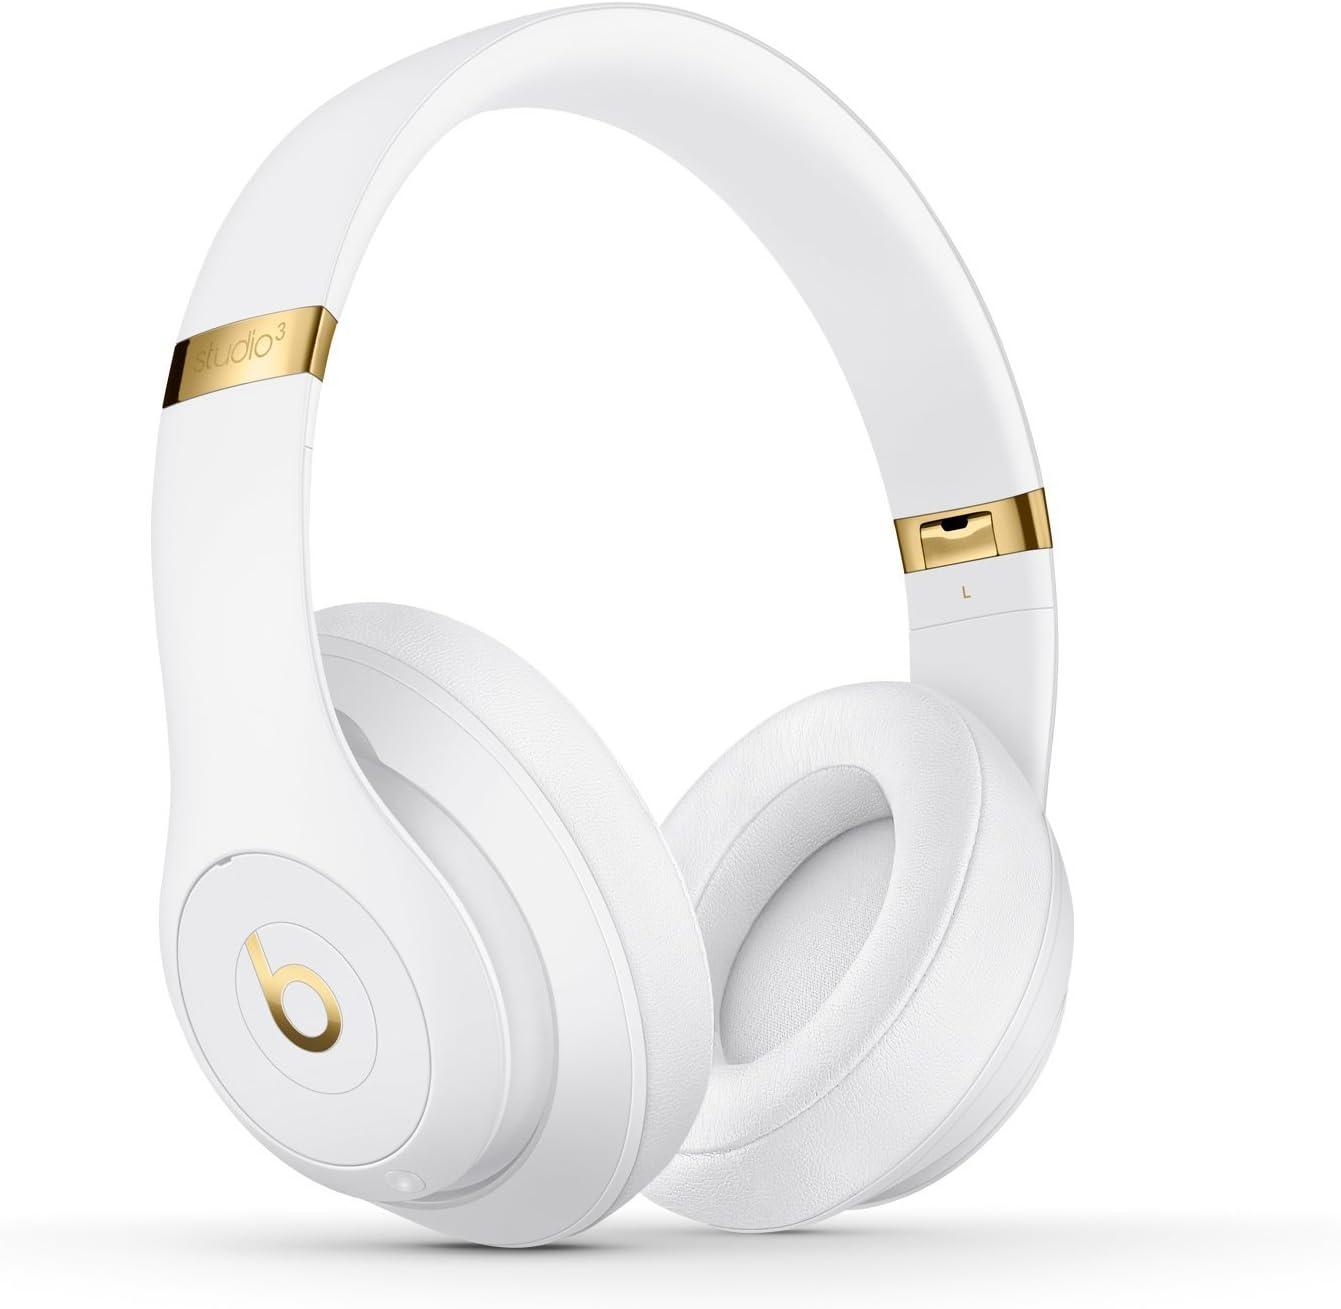 Beats by Dr. Dre Studio 3 Wireless Over-Ear Headphones